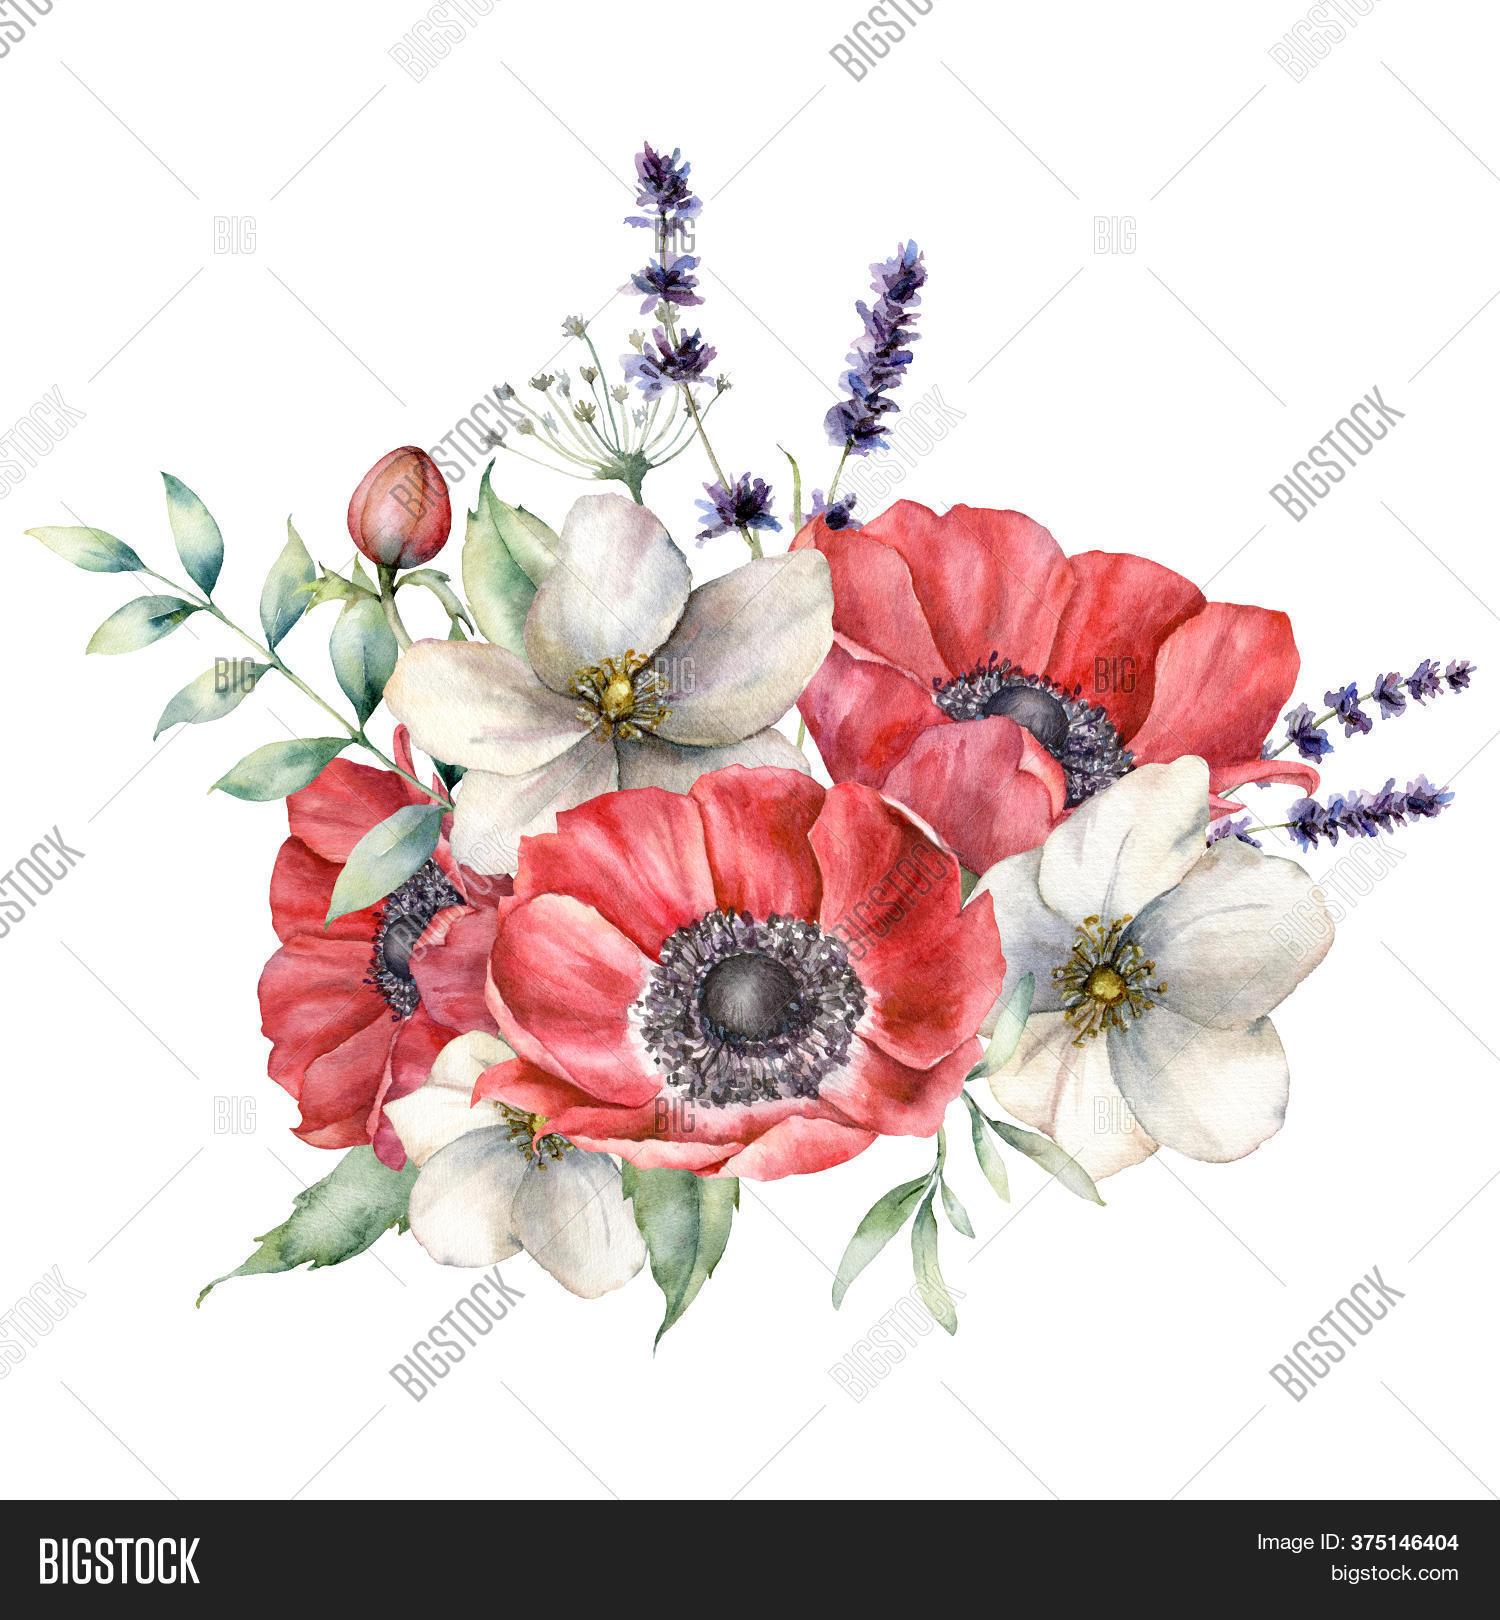 Watercolor Wildflowers Image Photo Free Trial Bigstock